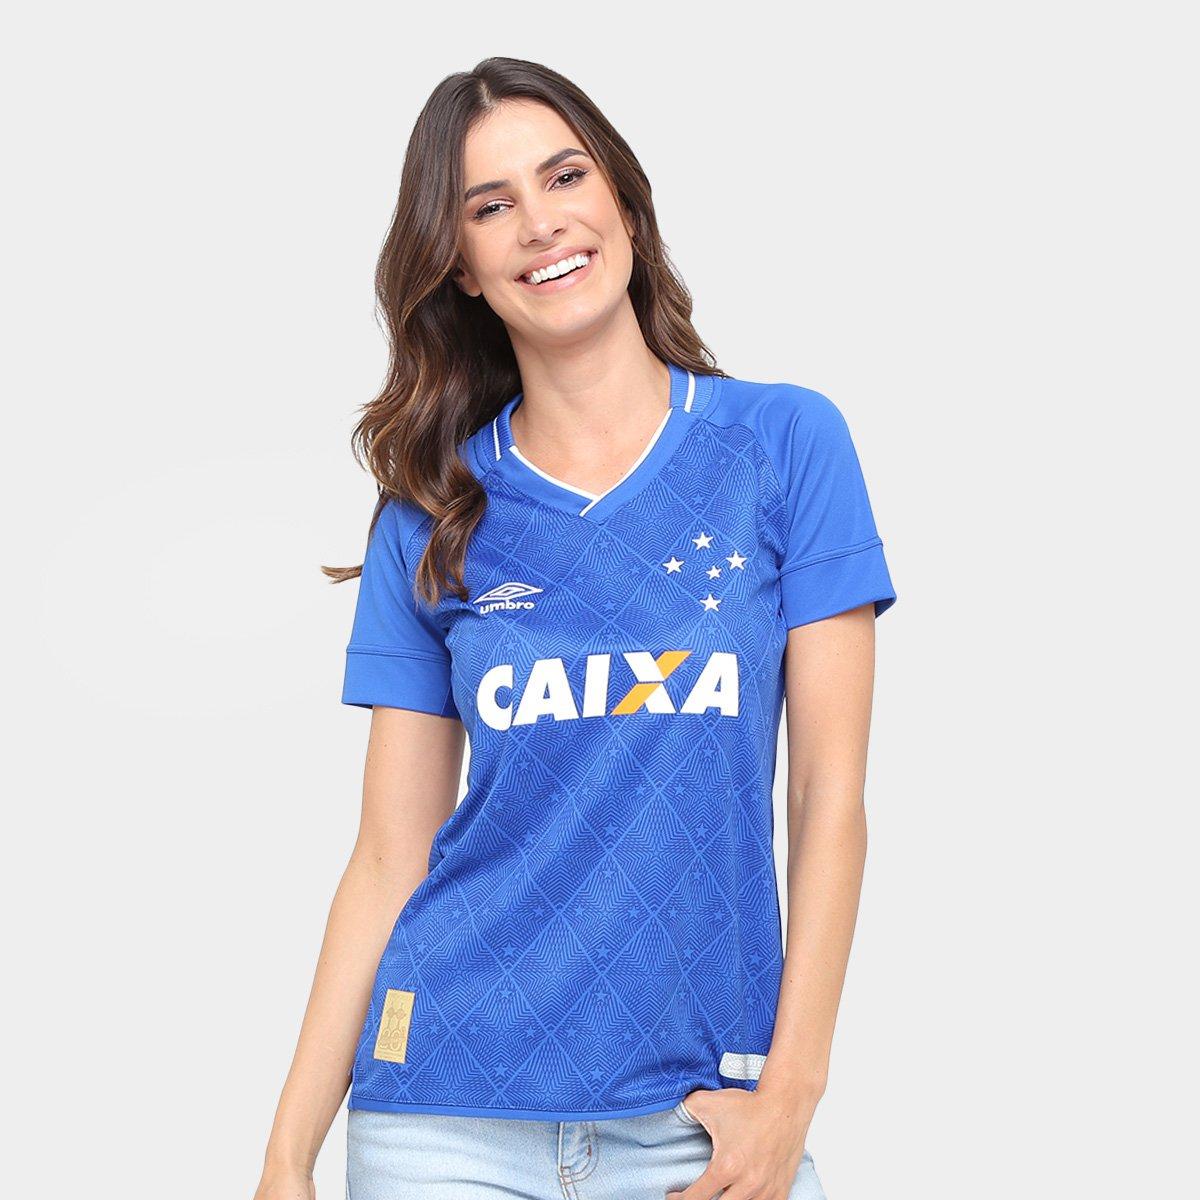 4fc3aa4b913b6 Camisa Cruzeiro I 17 18 s nº Torcedor Umbro Feminina - Compre Agora ...